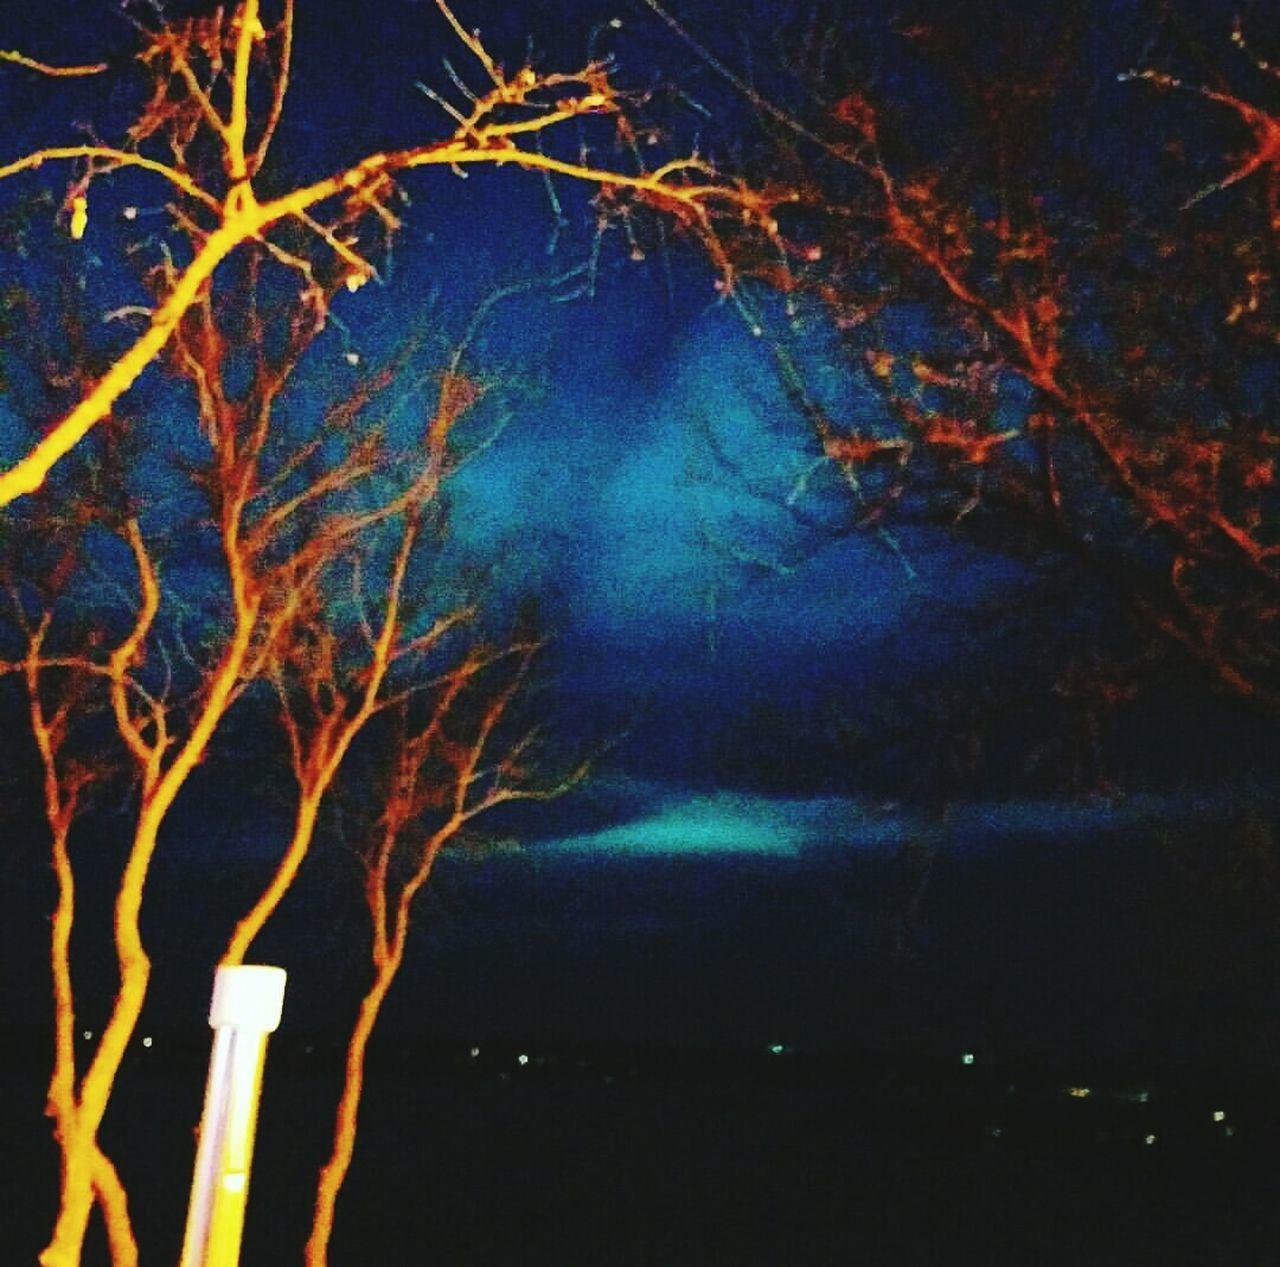 night, no people, nature, beauty in nature, outdoors, scenics, illuminated, sky, tree, close-up